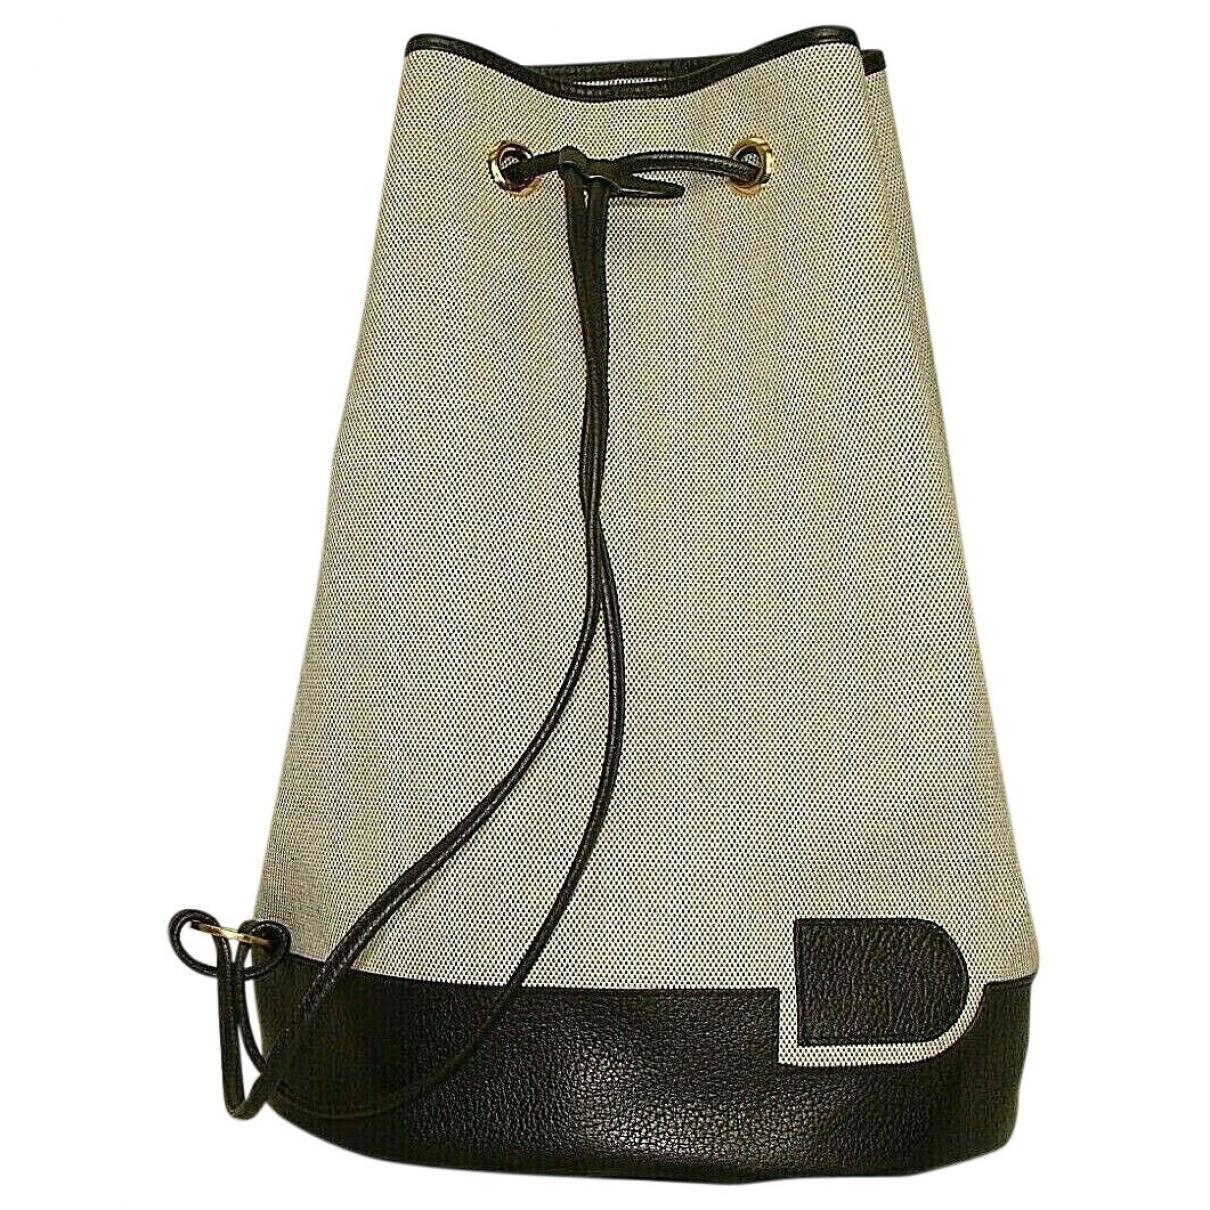 Delvaux \N Handtasche in  Ecru Leinen